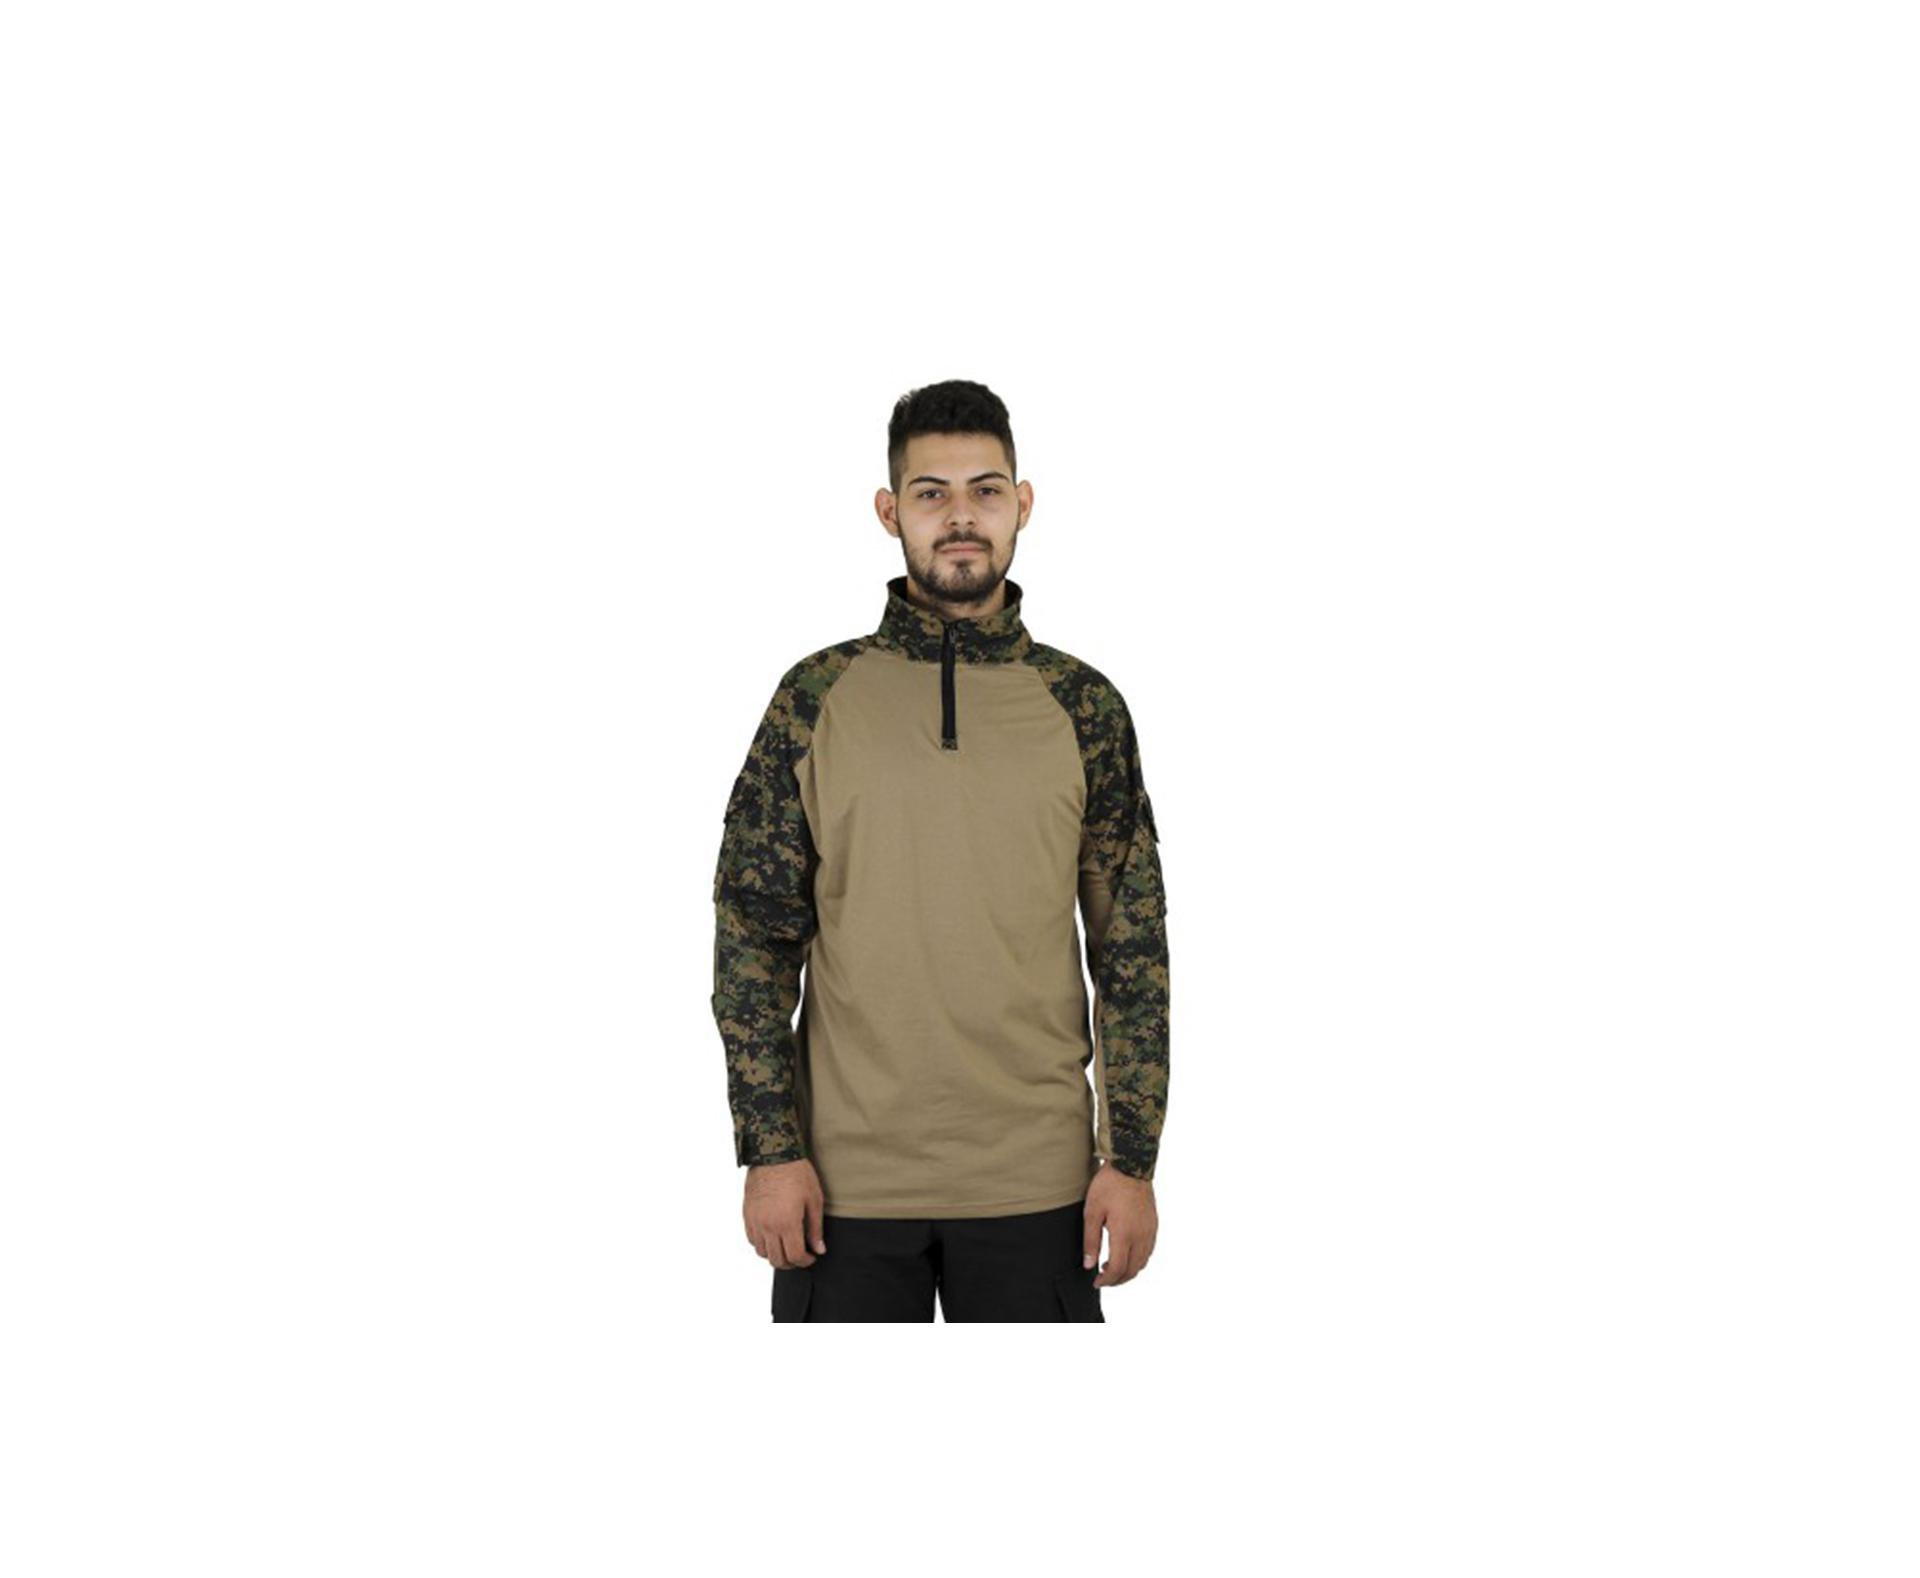 Camisa Combat Shirt Marpat - Bravo